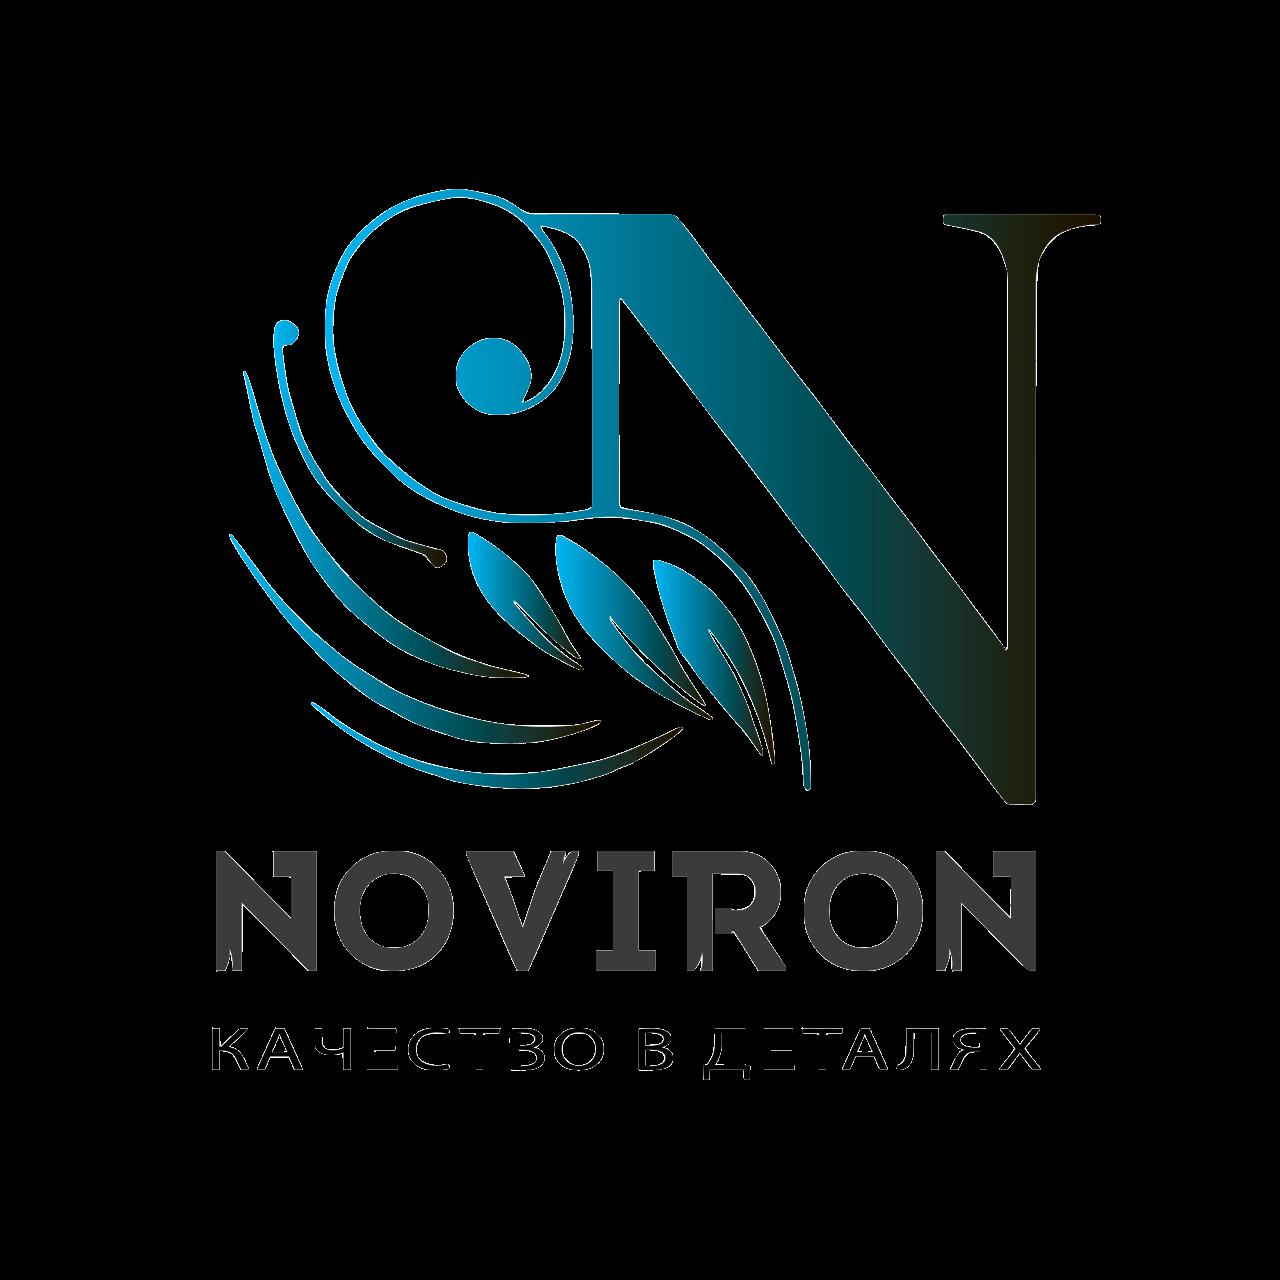 NOVIRON